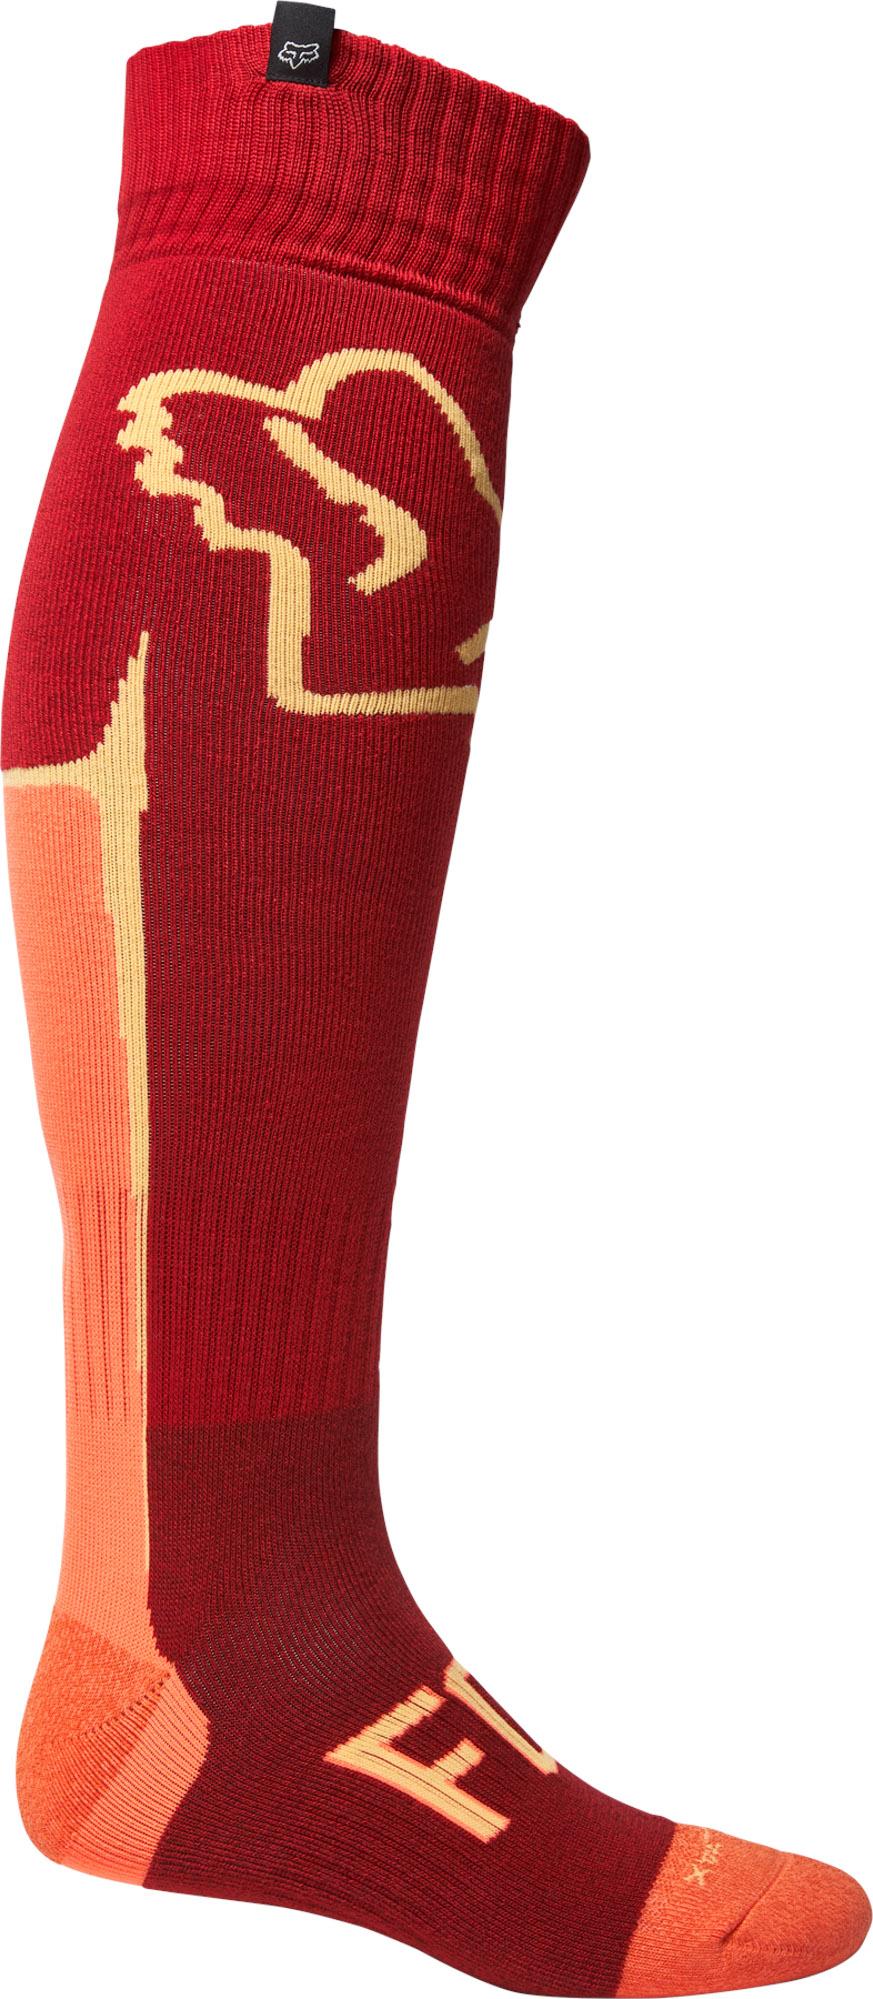 FOX Cntro Coolmax Thin Sock - Flame RED MX22